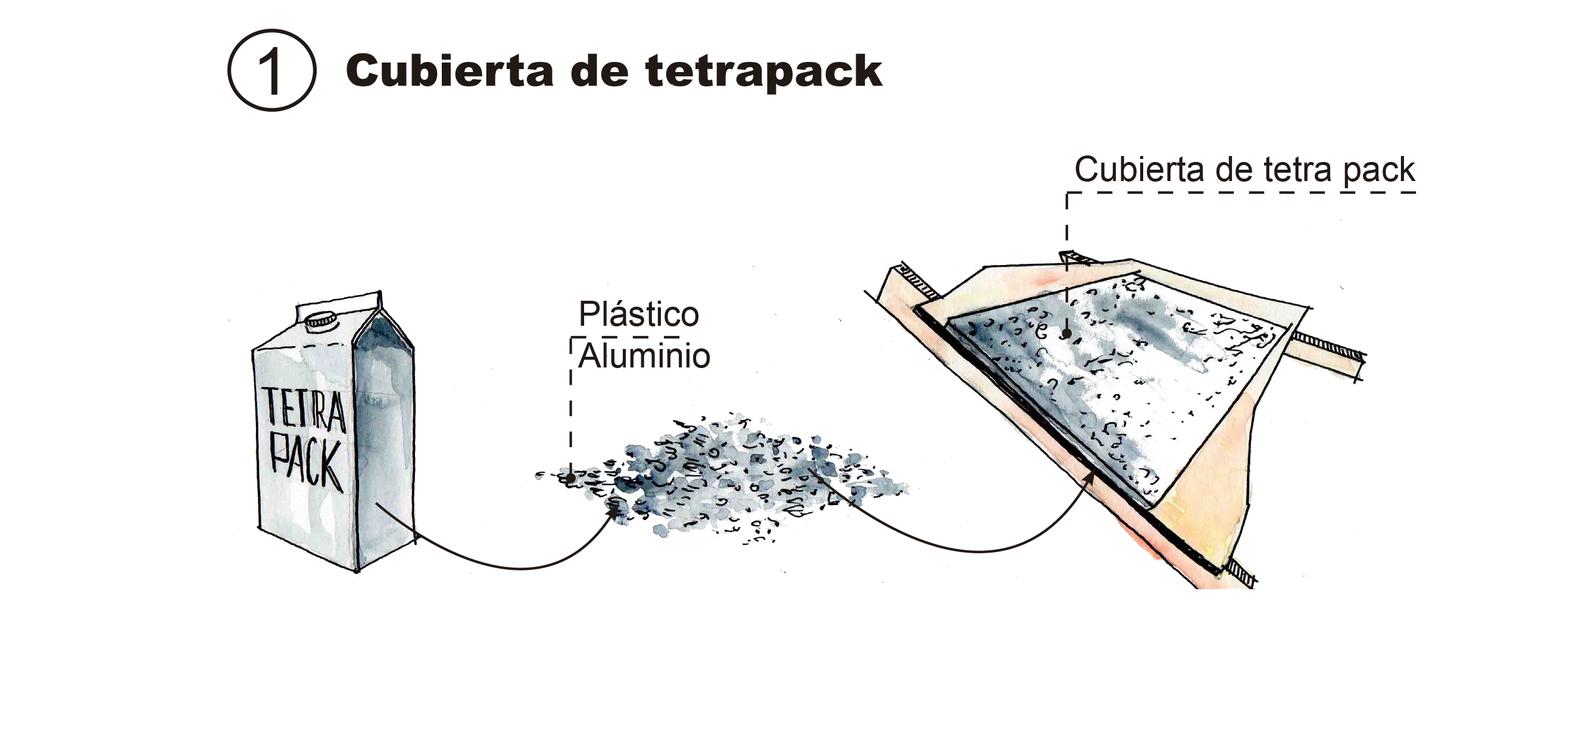 1_Cubierta_tetrapack.jpg